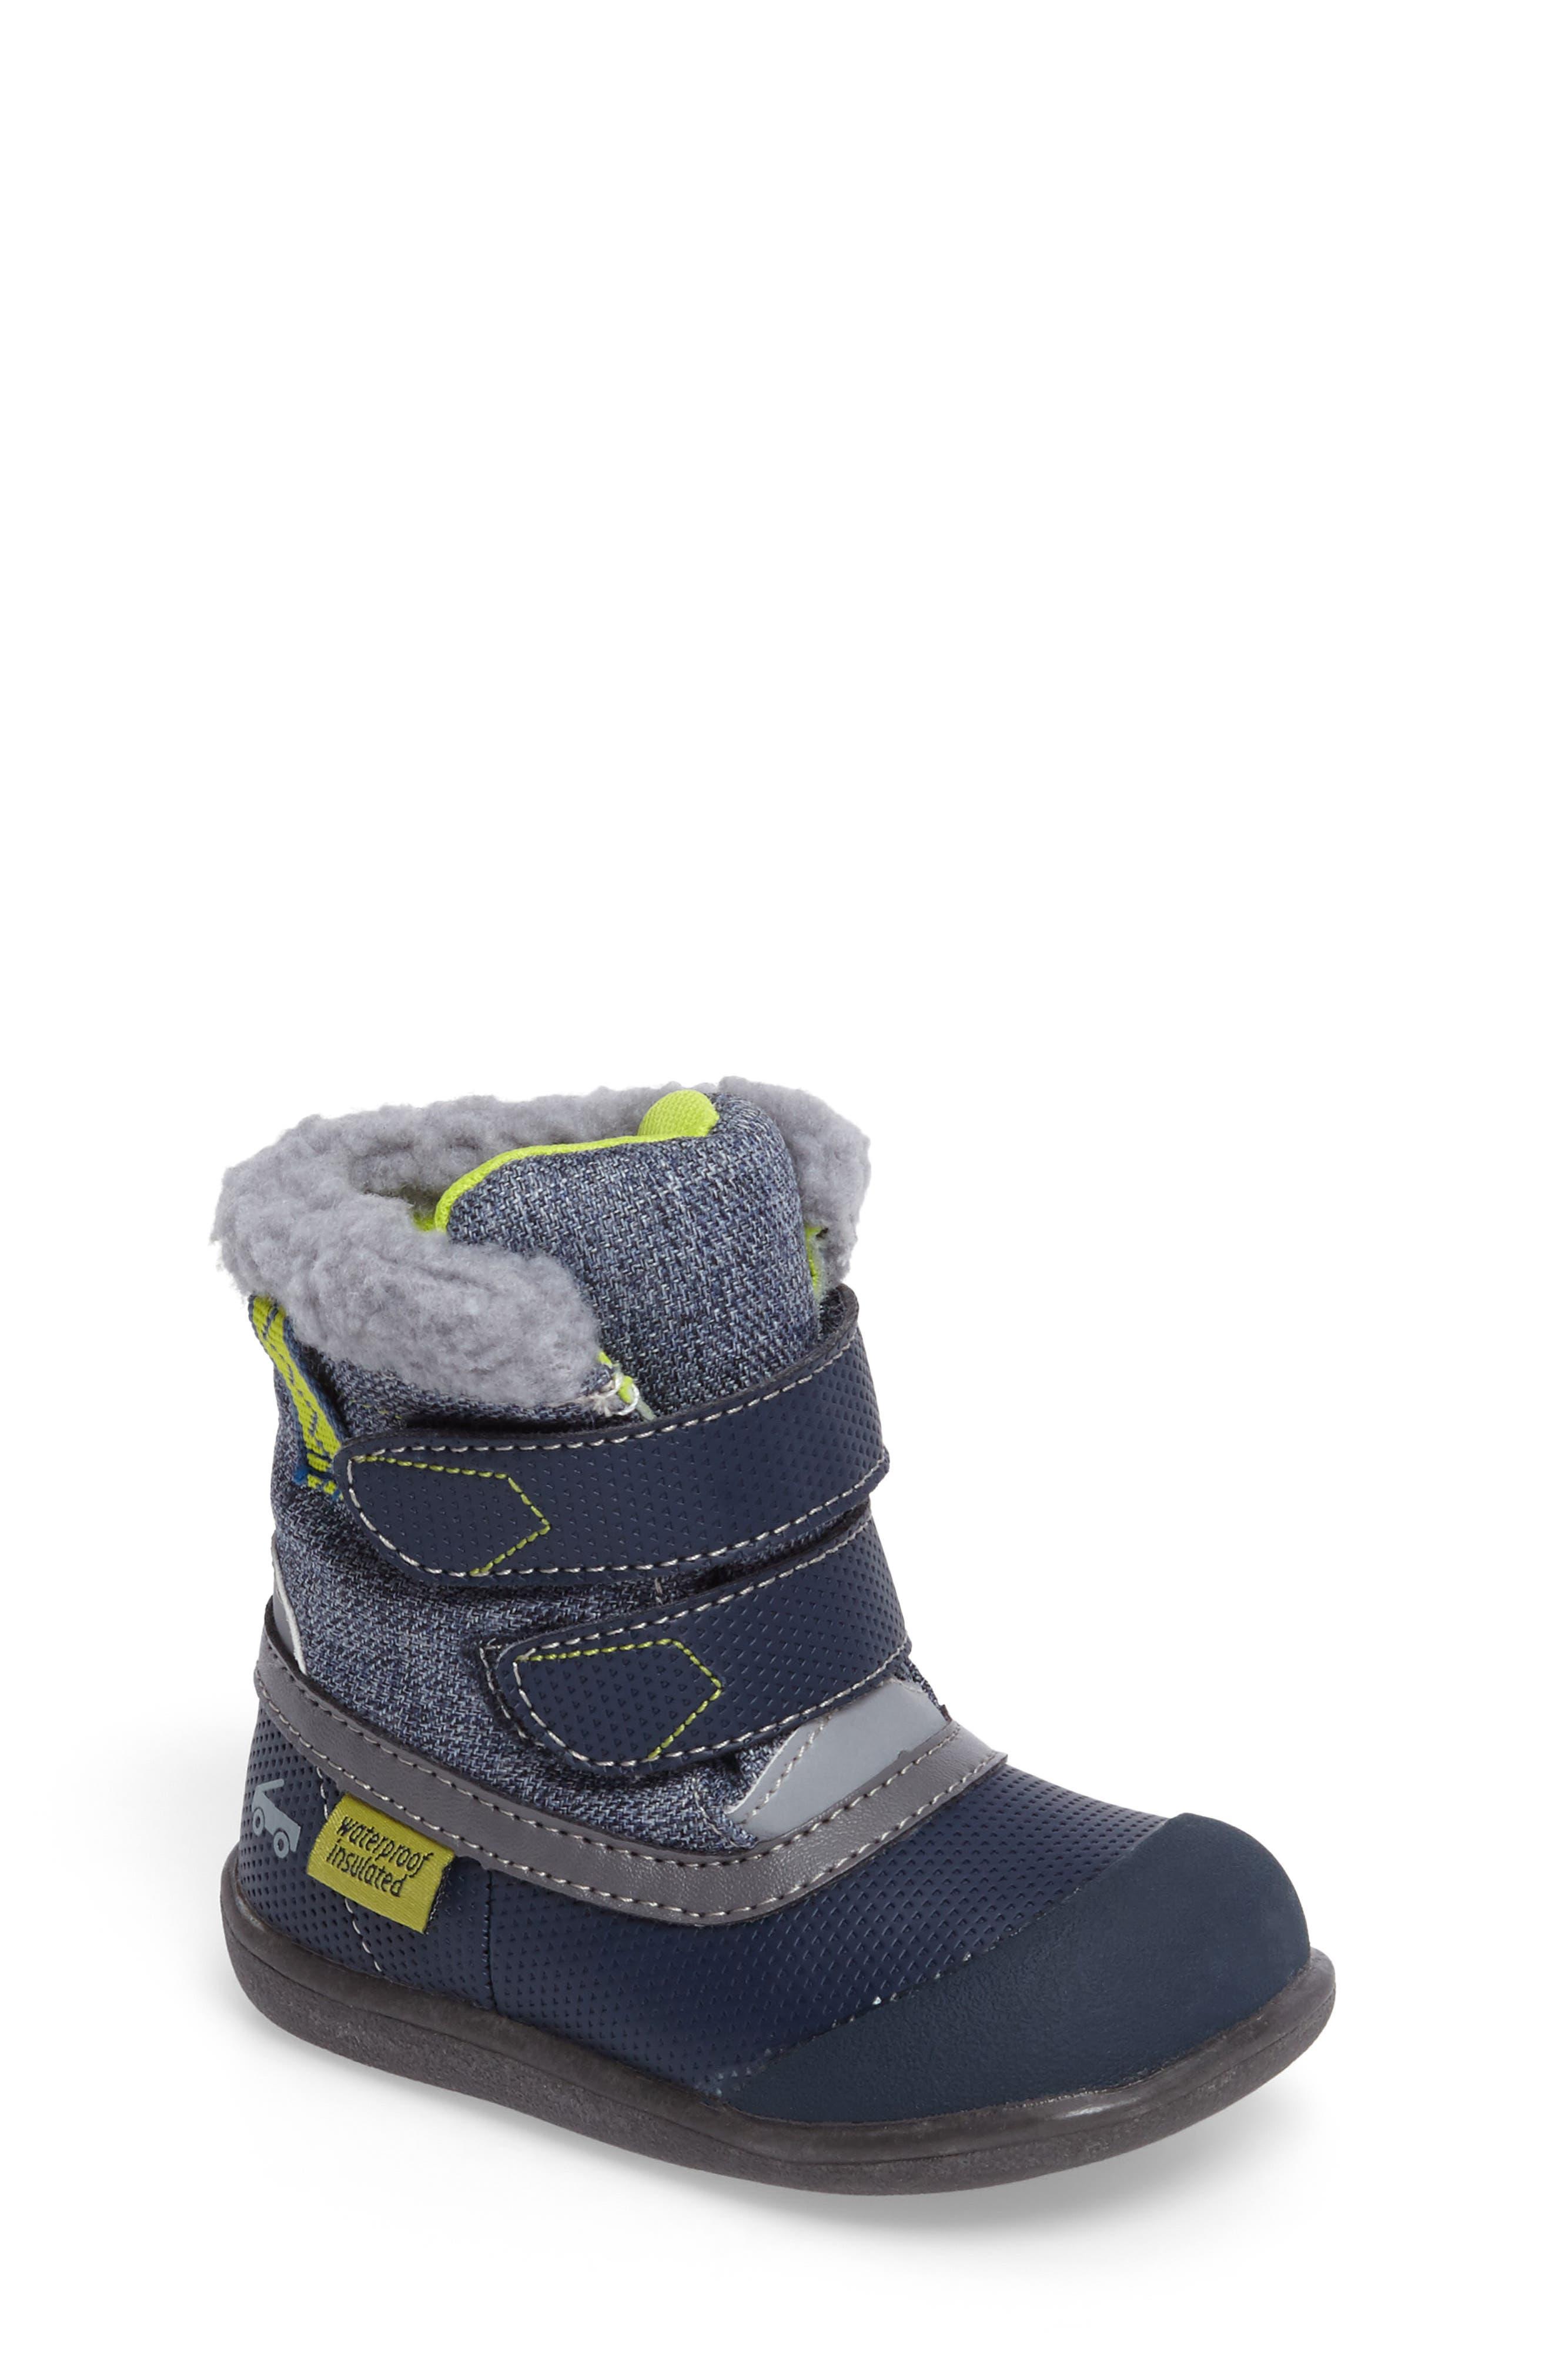 See Kai Run Charlie Waterproof Insulated Boot (Baby, Walker, Toddler & Little Kid)